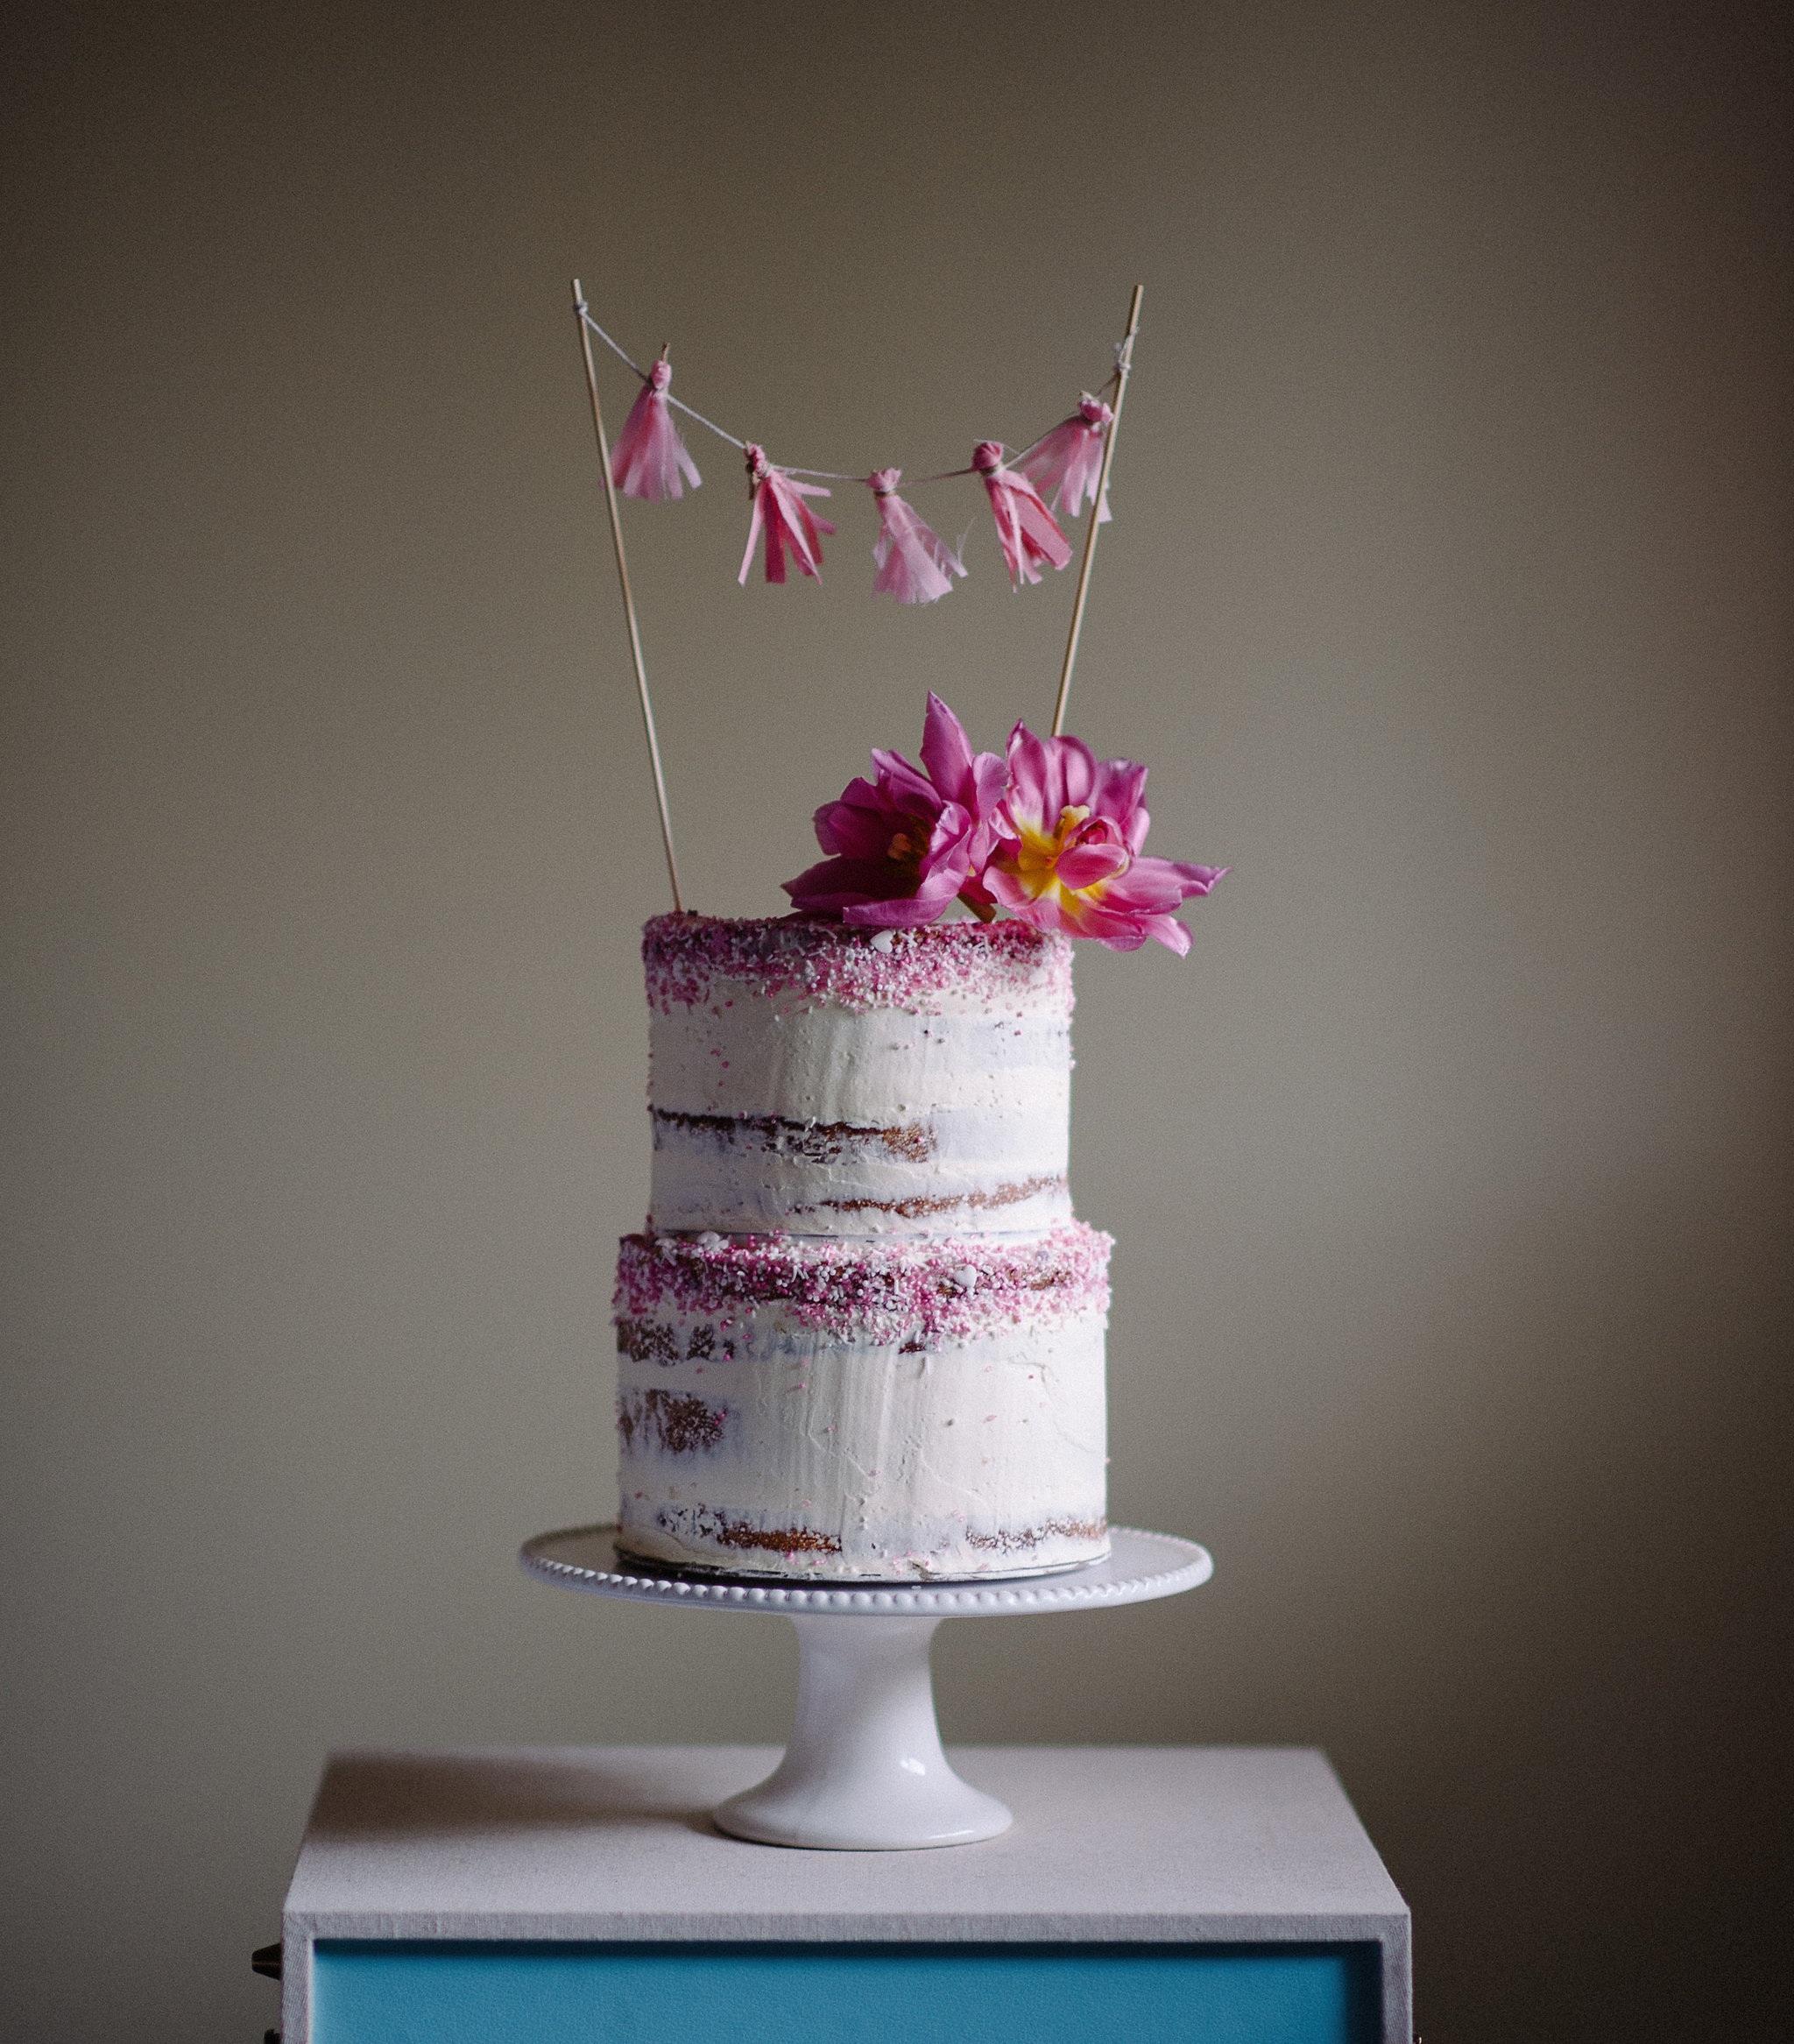 cherry-cakes-8-001.jpg